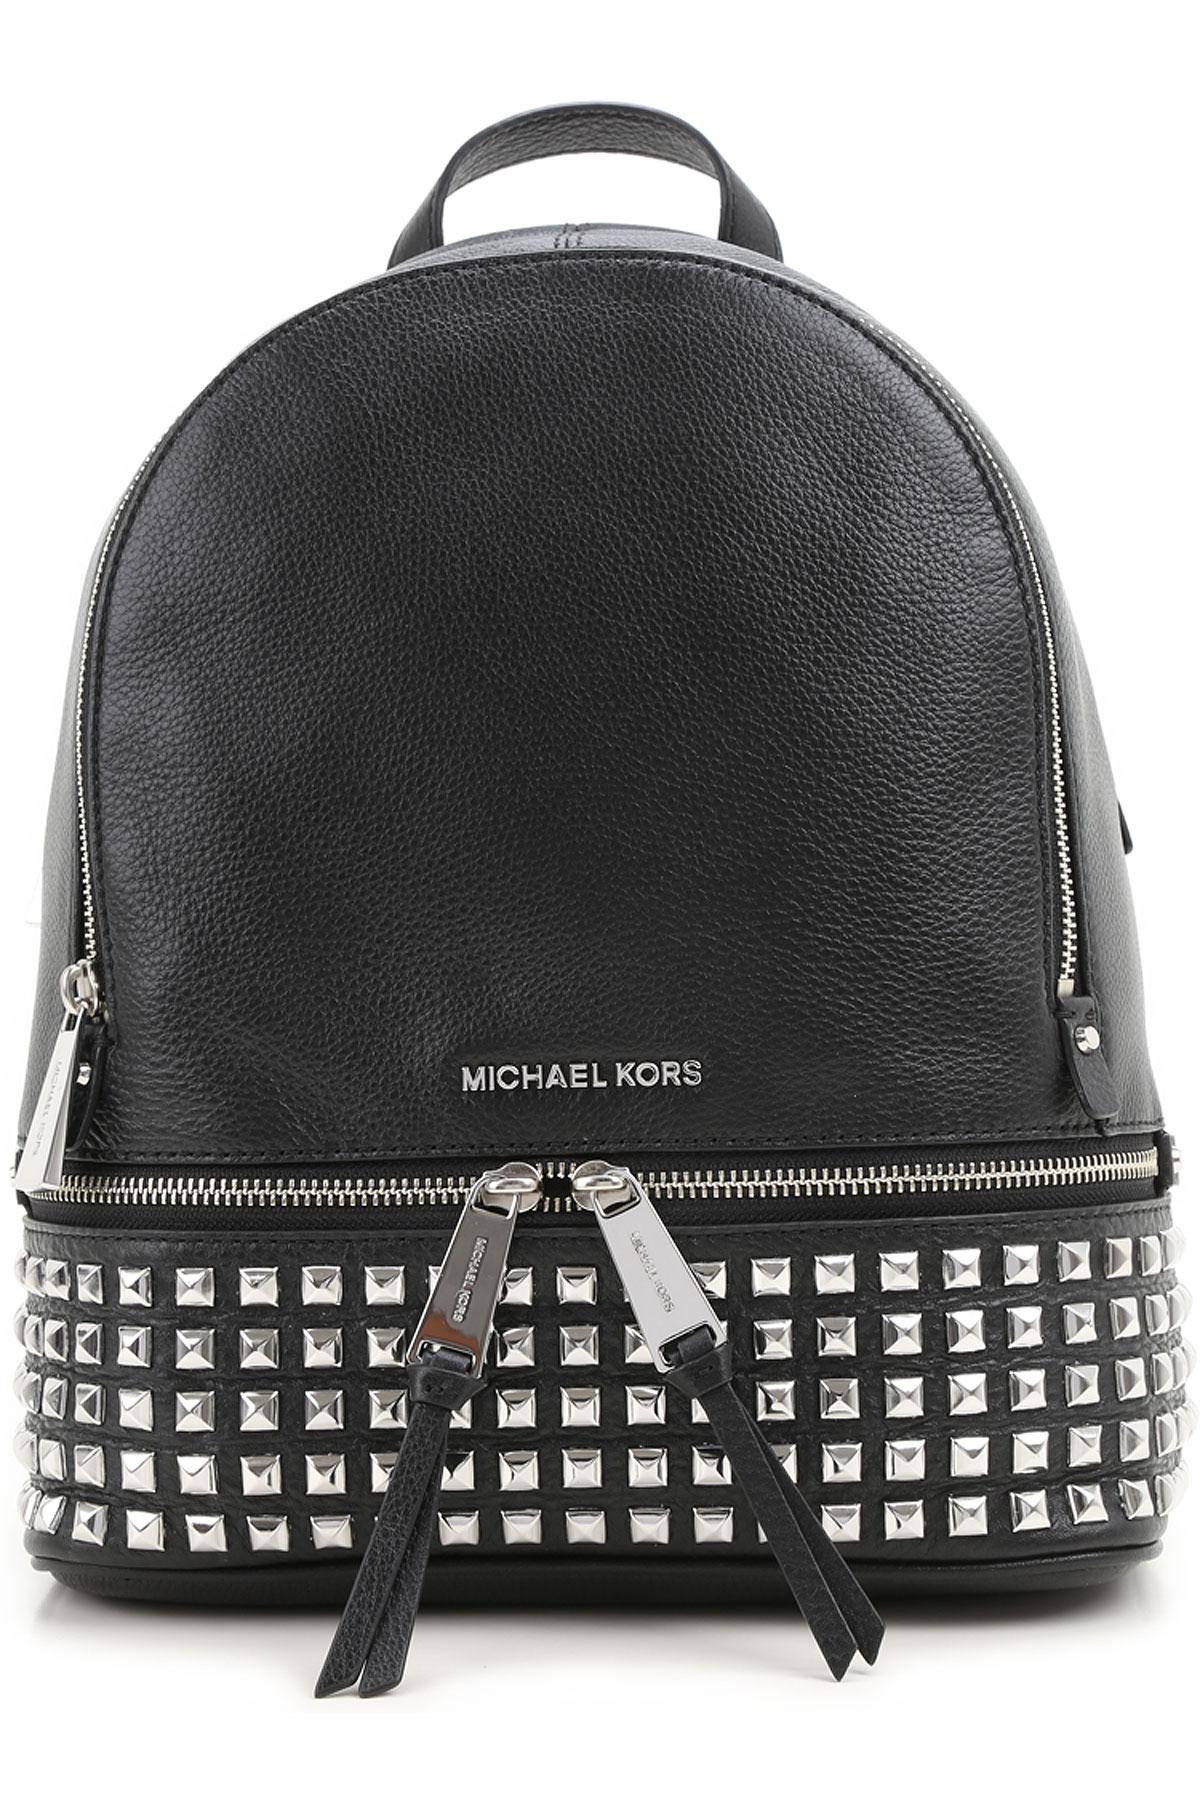 Image of Michael Kors Backpack for Women, Rhea Zip, Black, Leather, 2017